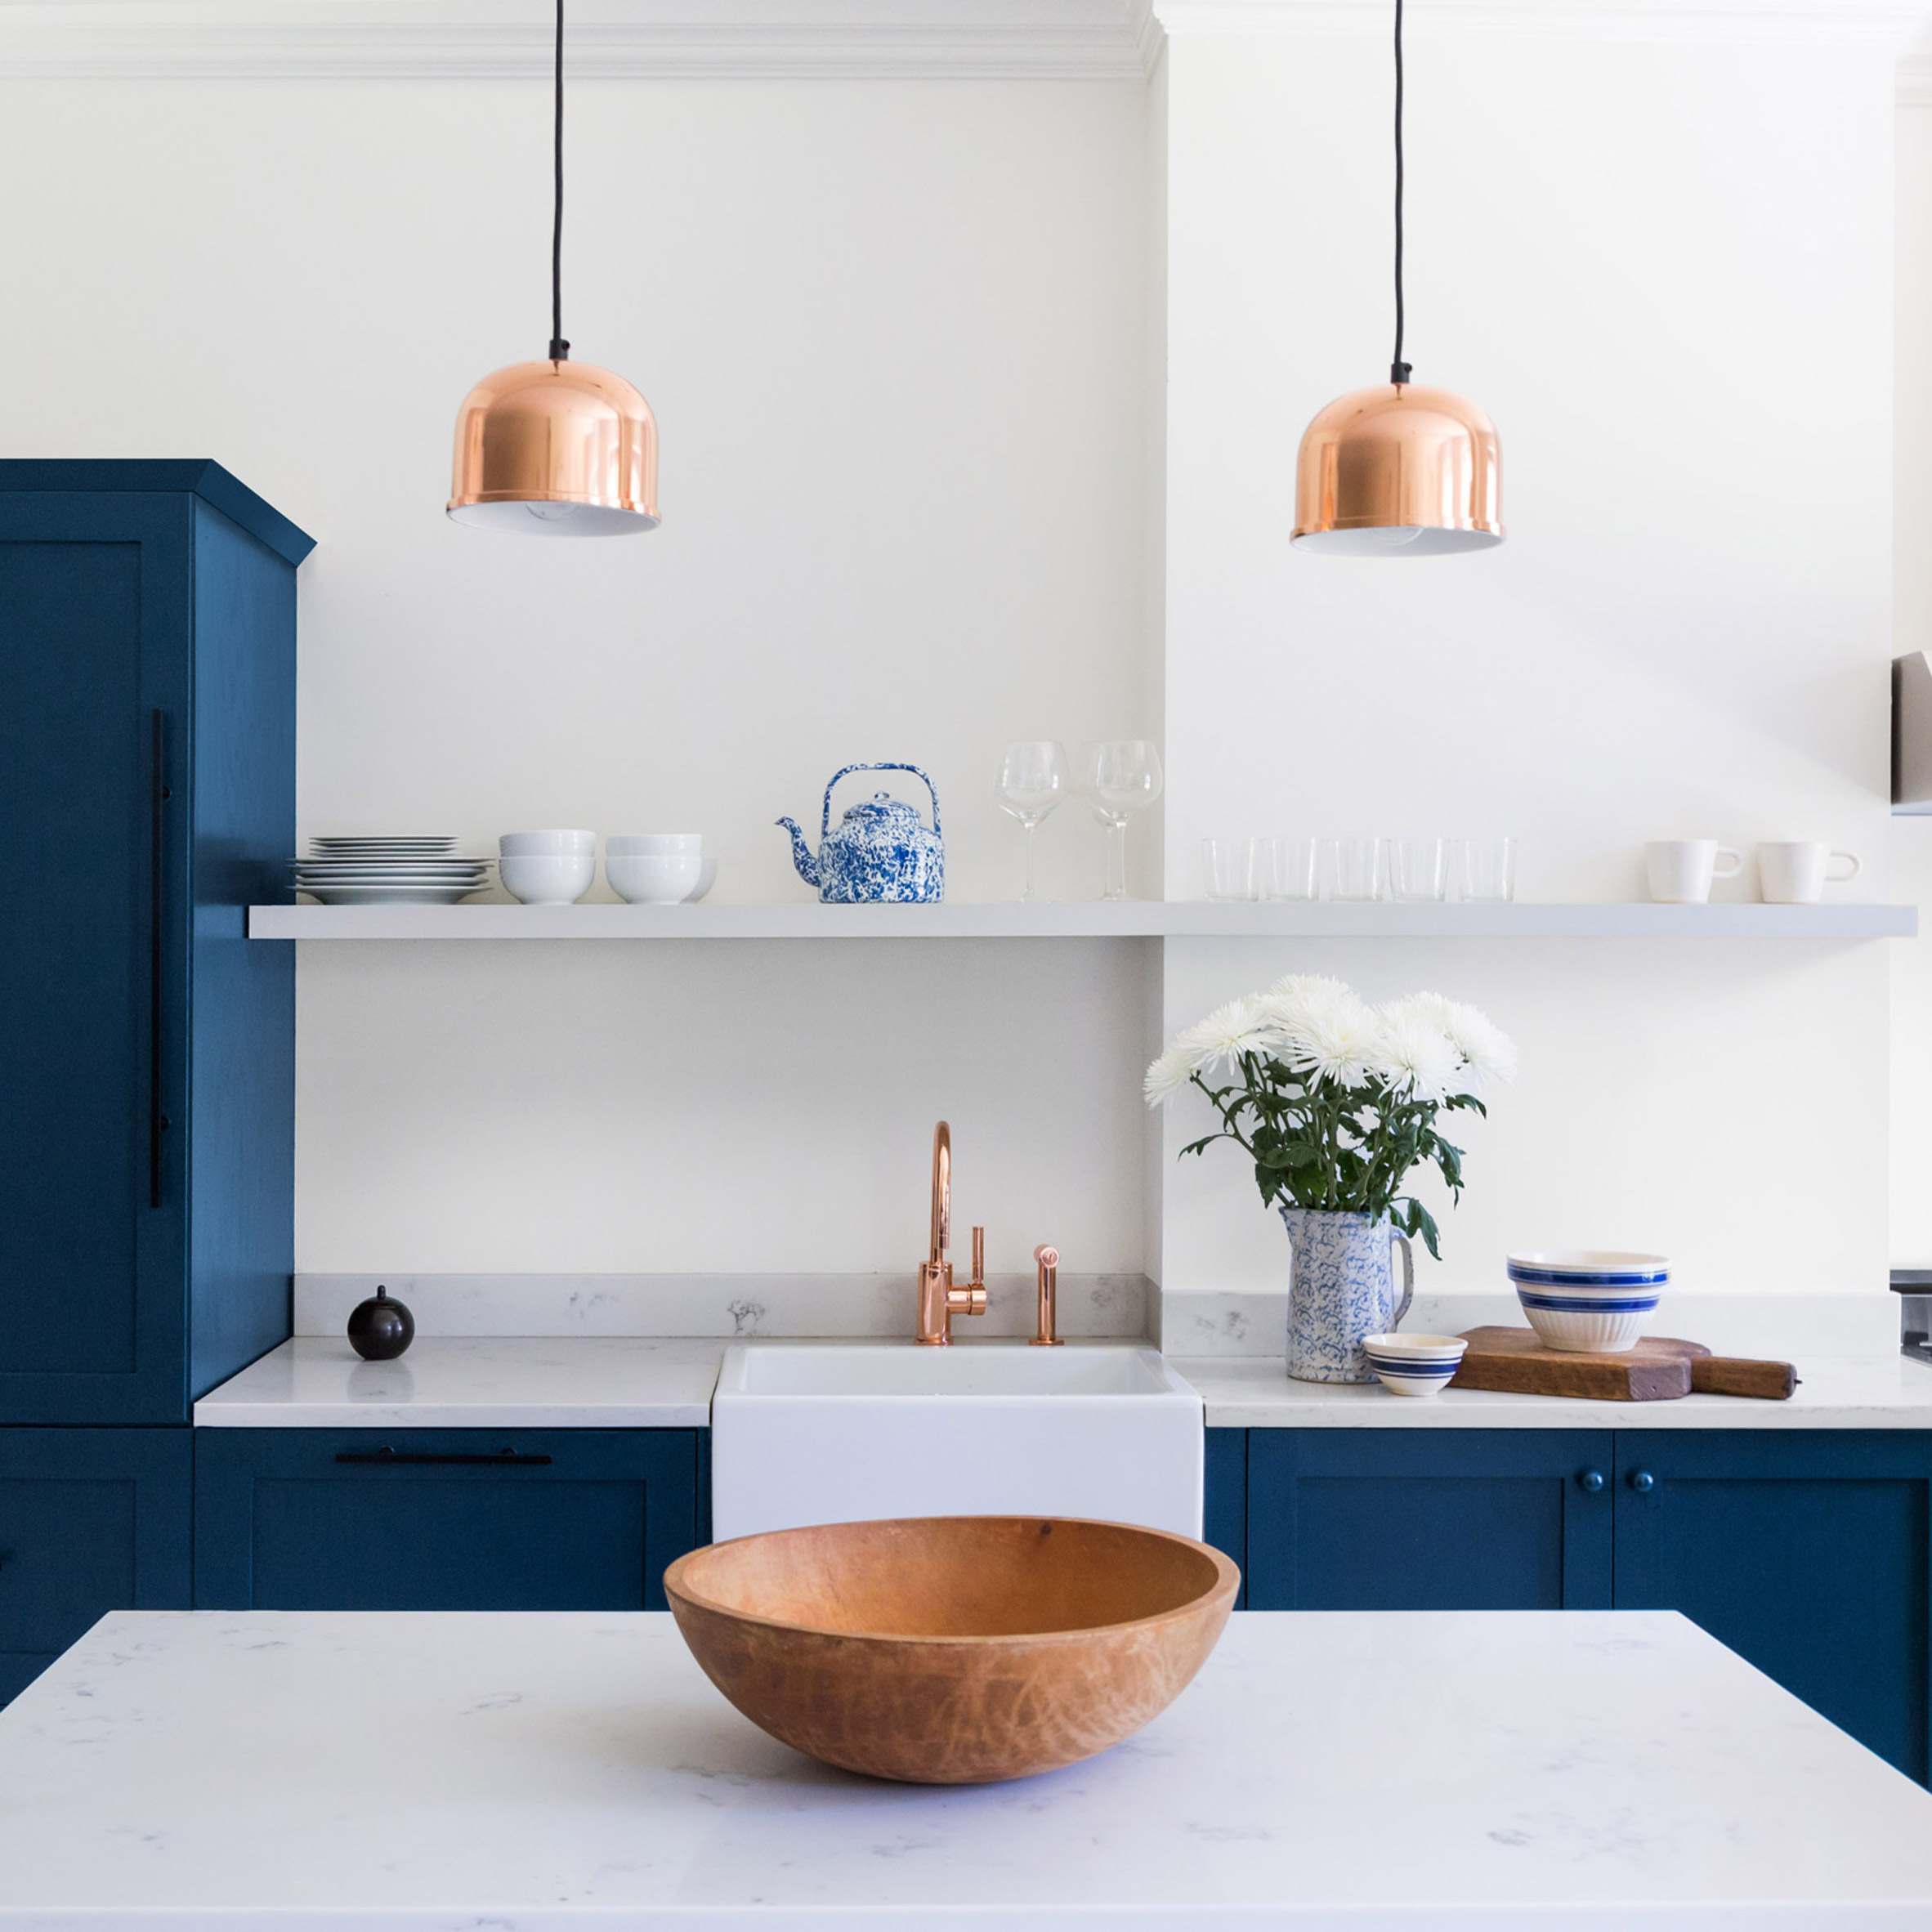 interior design for a house. Residential Interior design stories from Dezeen magazine